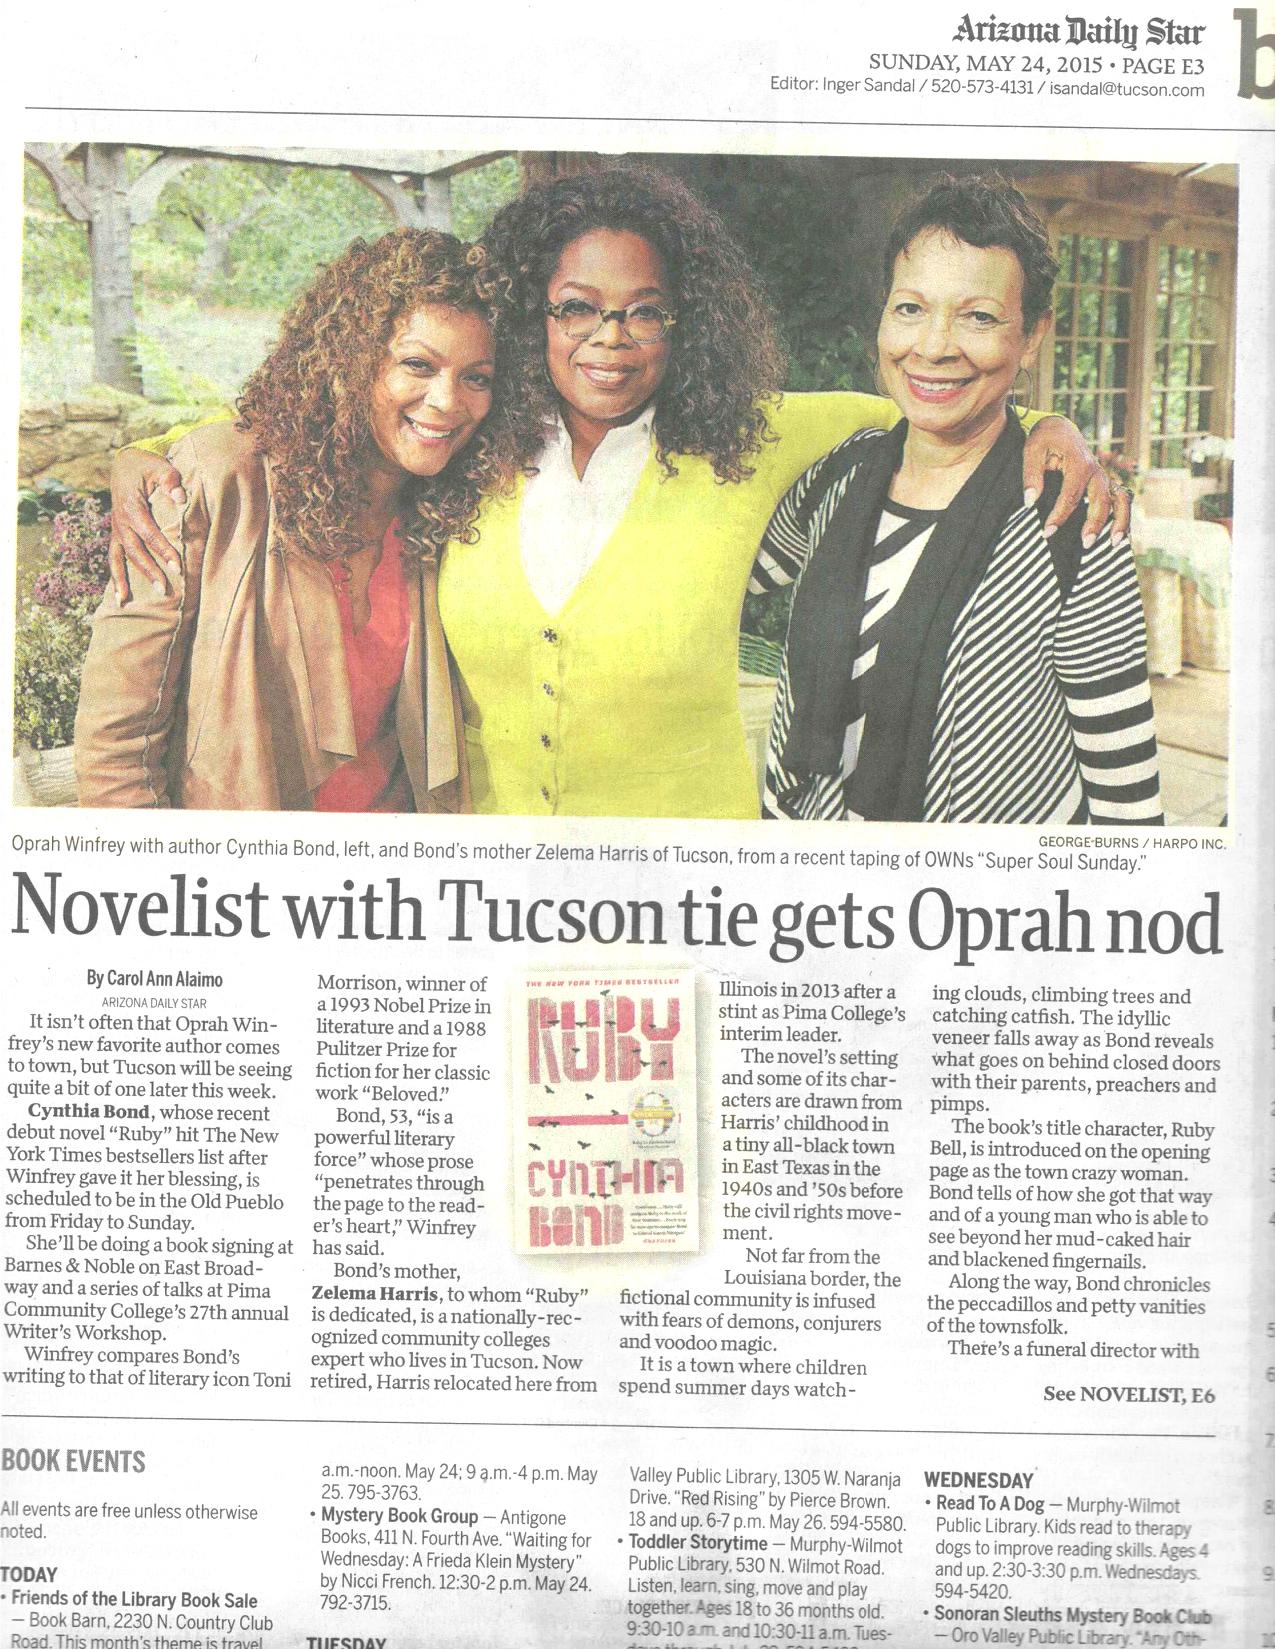 Arizona Daily Star - Novelist with Tucson tie gets Oprah nod